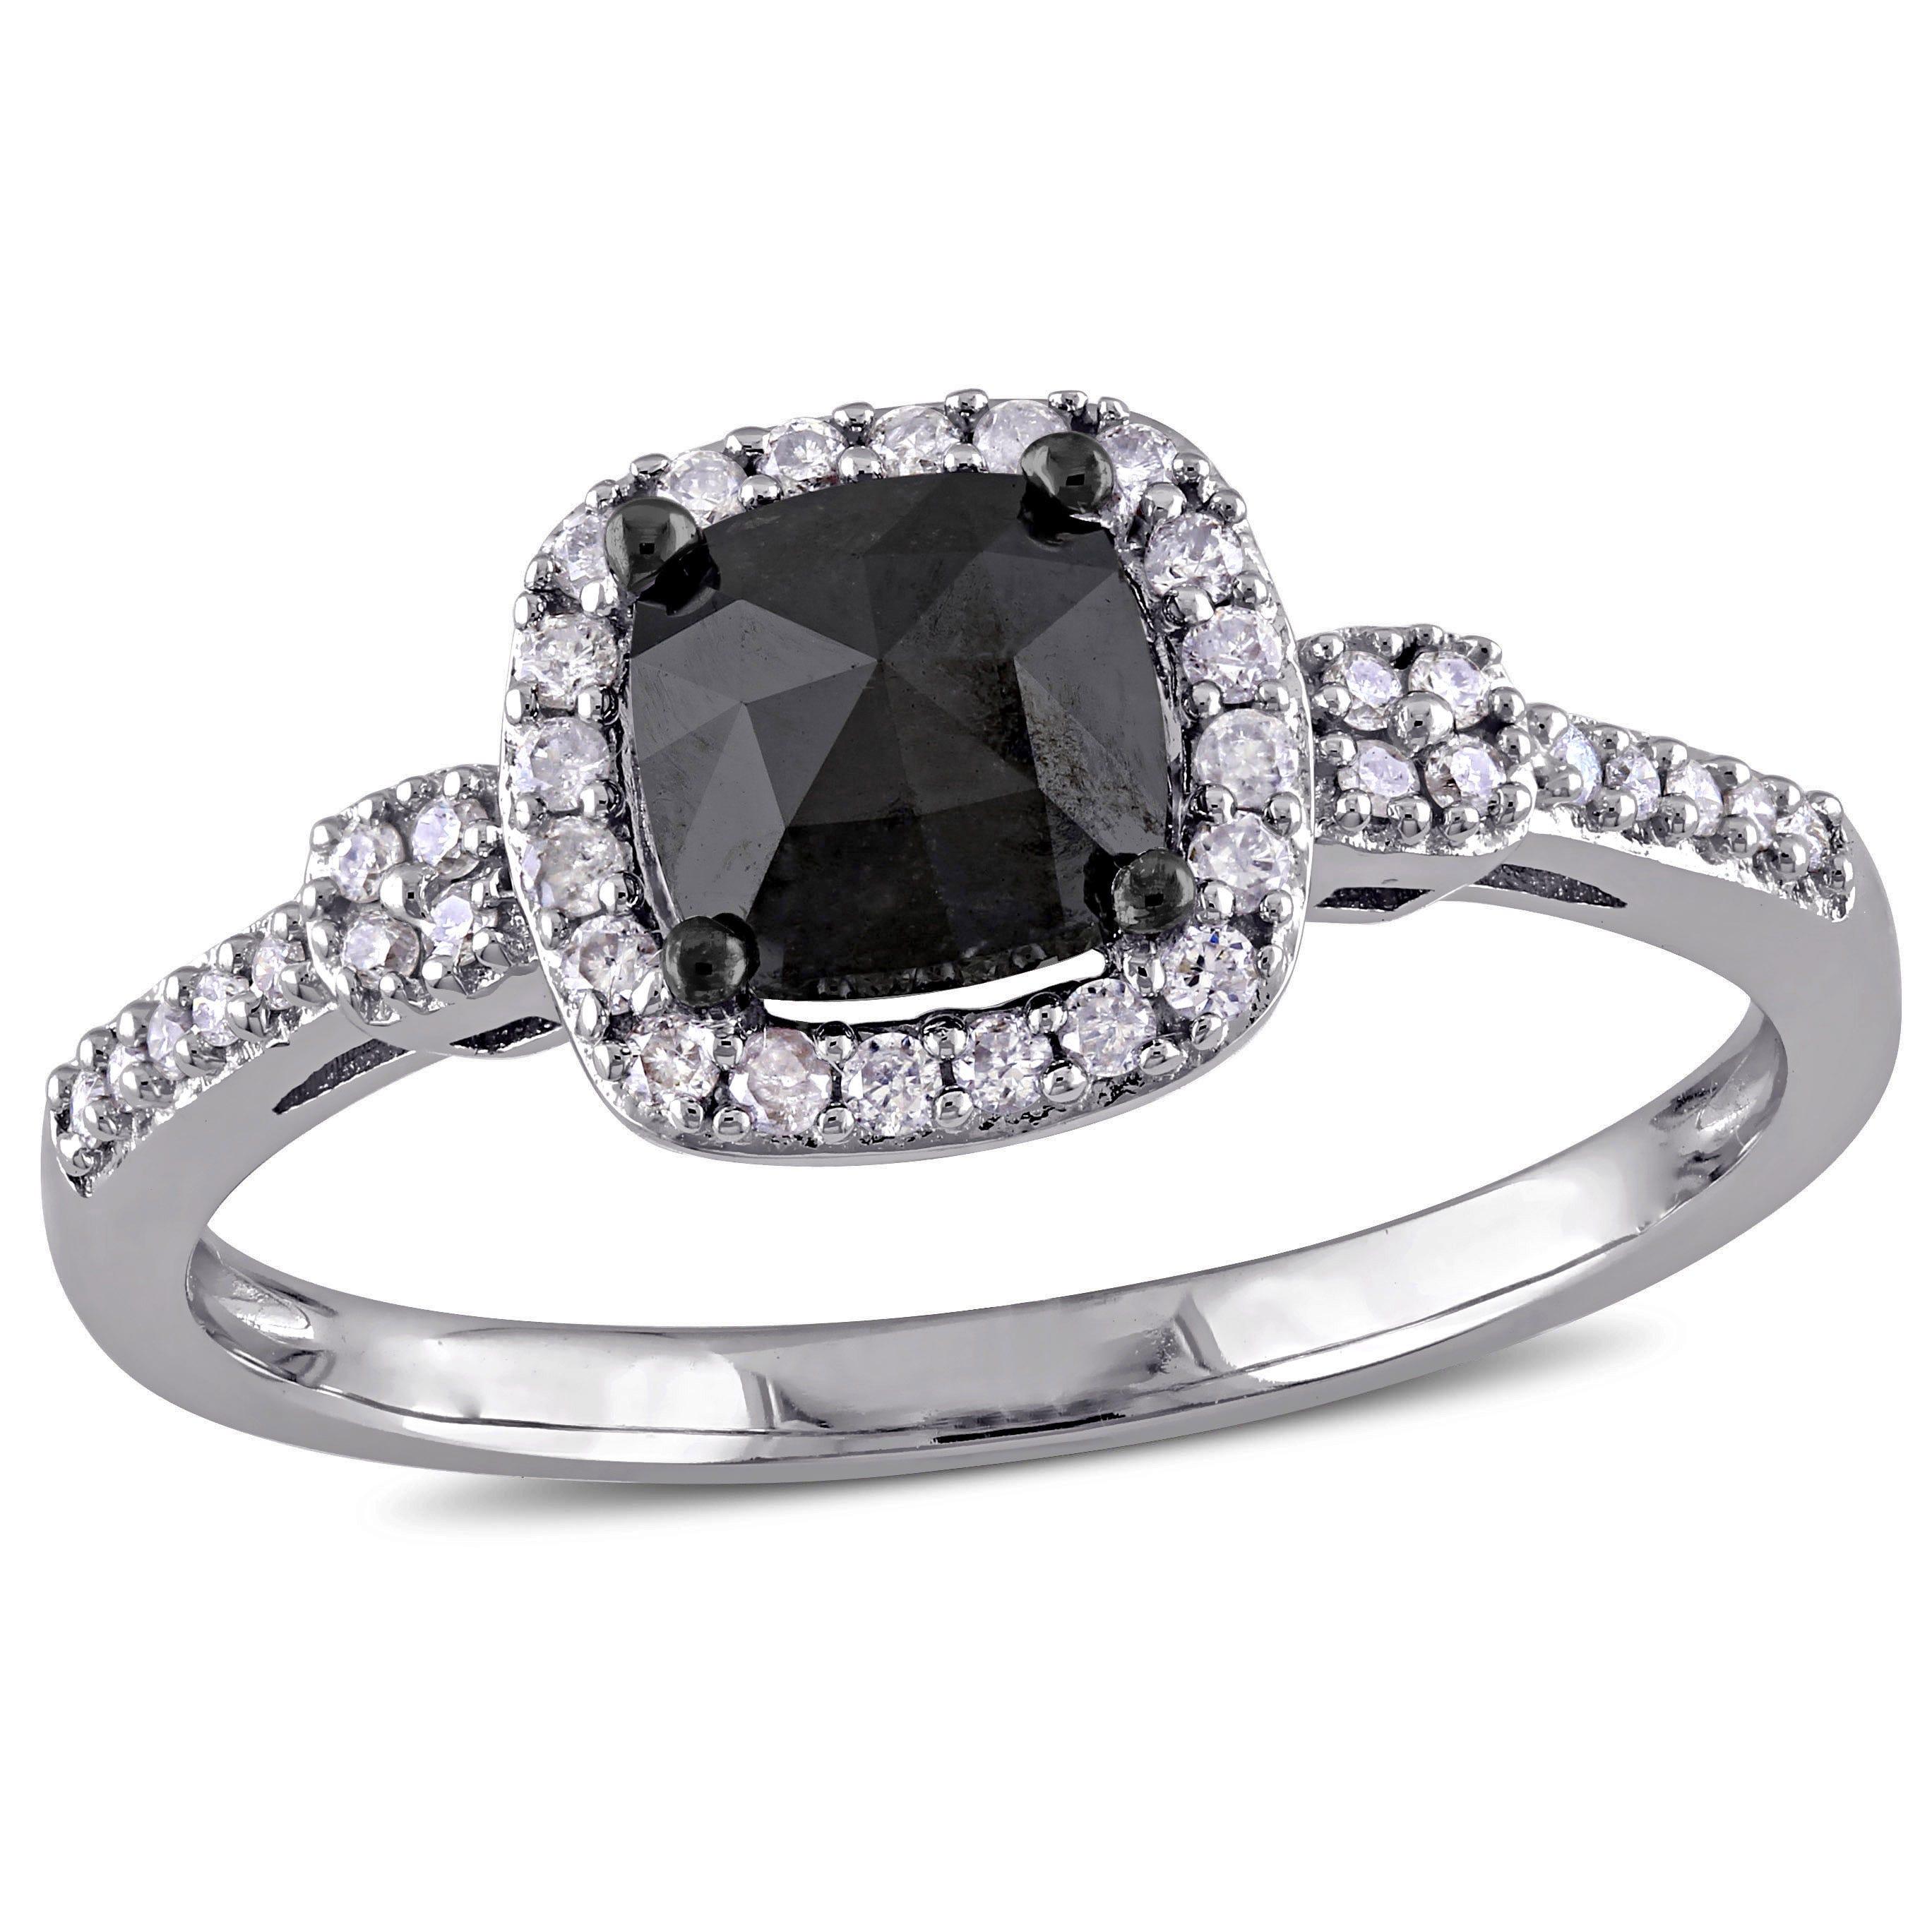 Cushion-Cut Black & White Diamond Halo 1ctw. Engagement Ring in 14k White Gold